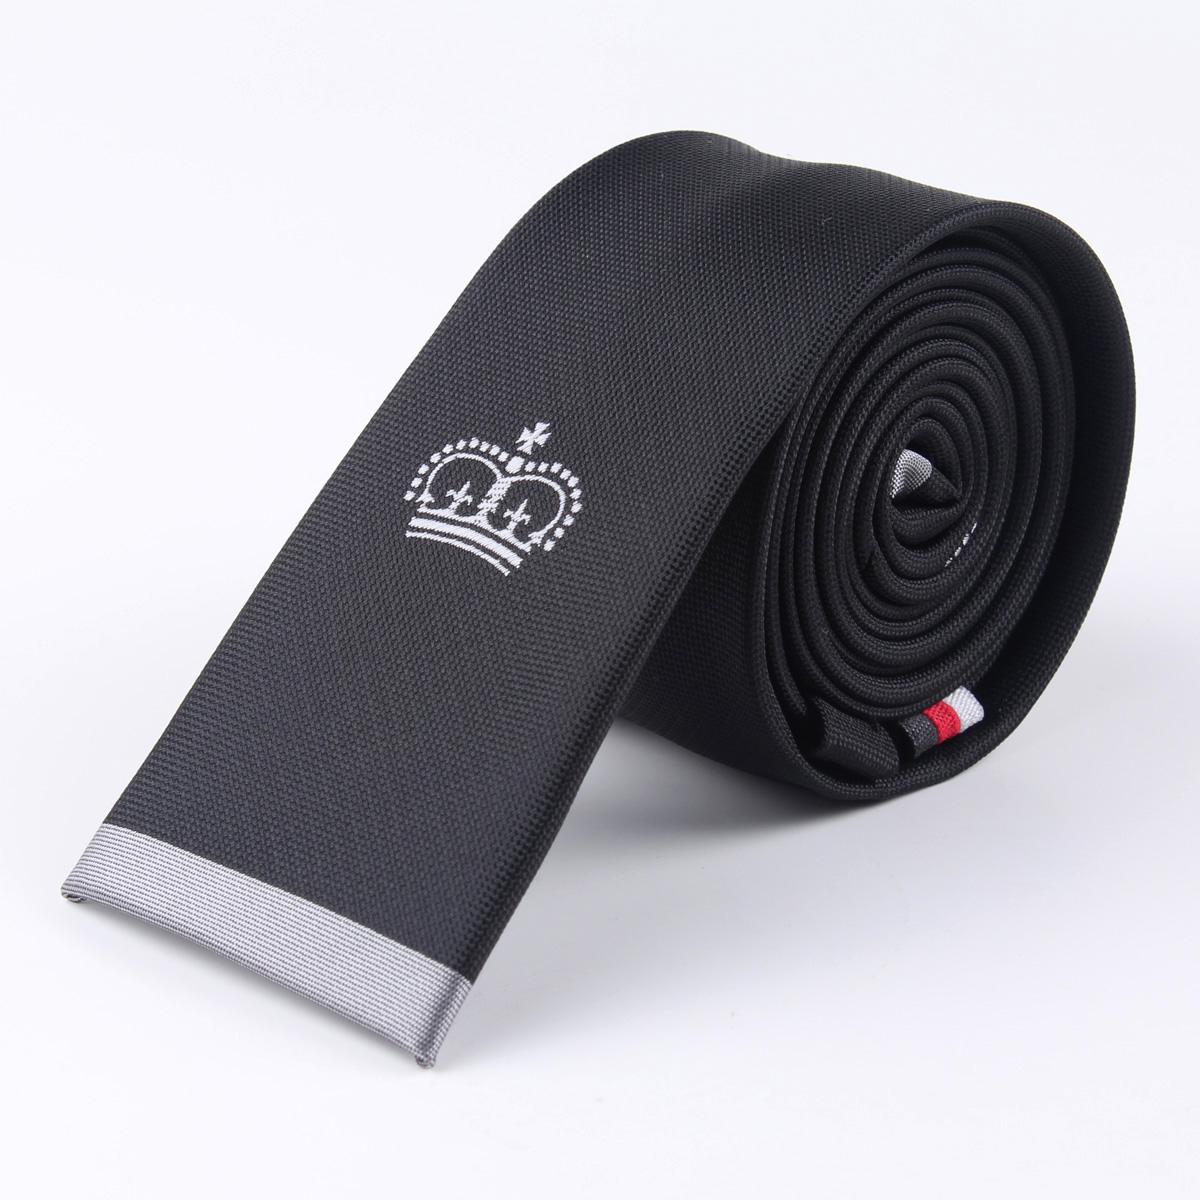 TreeSmile 新款平头领带潮男时尚窄logo领带皇冠标记黑色韩版